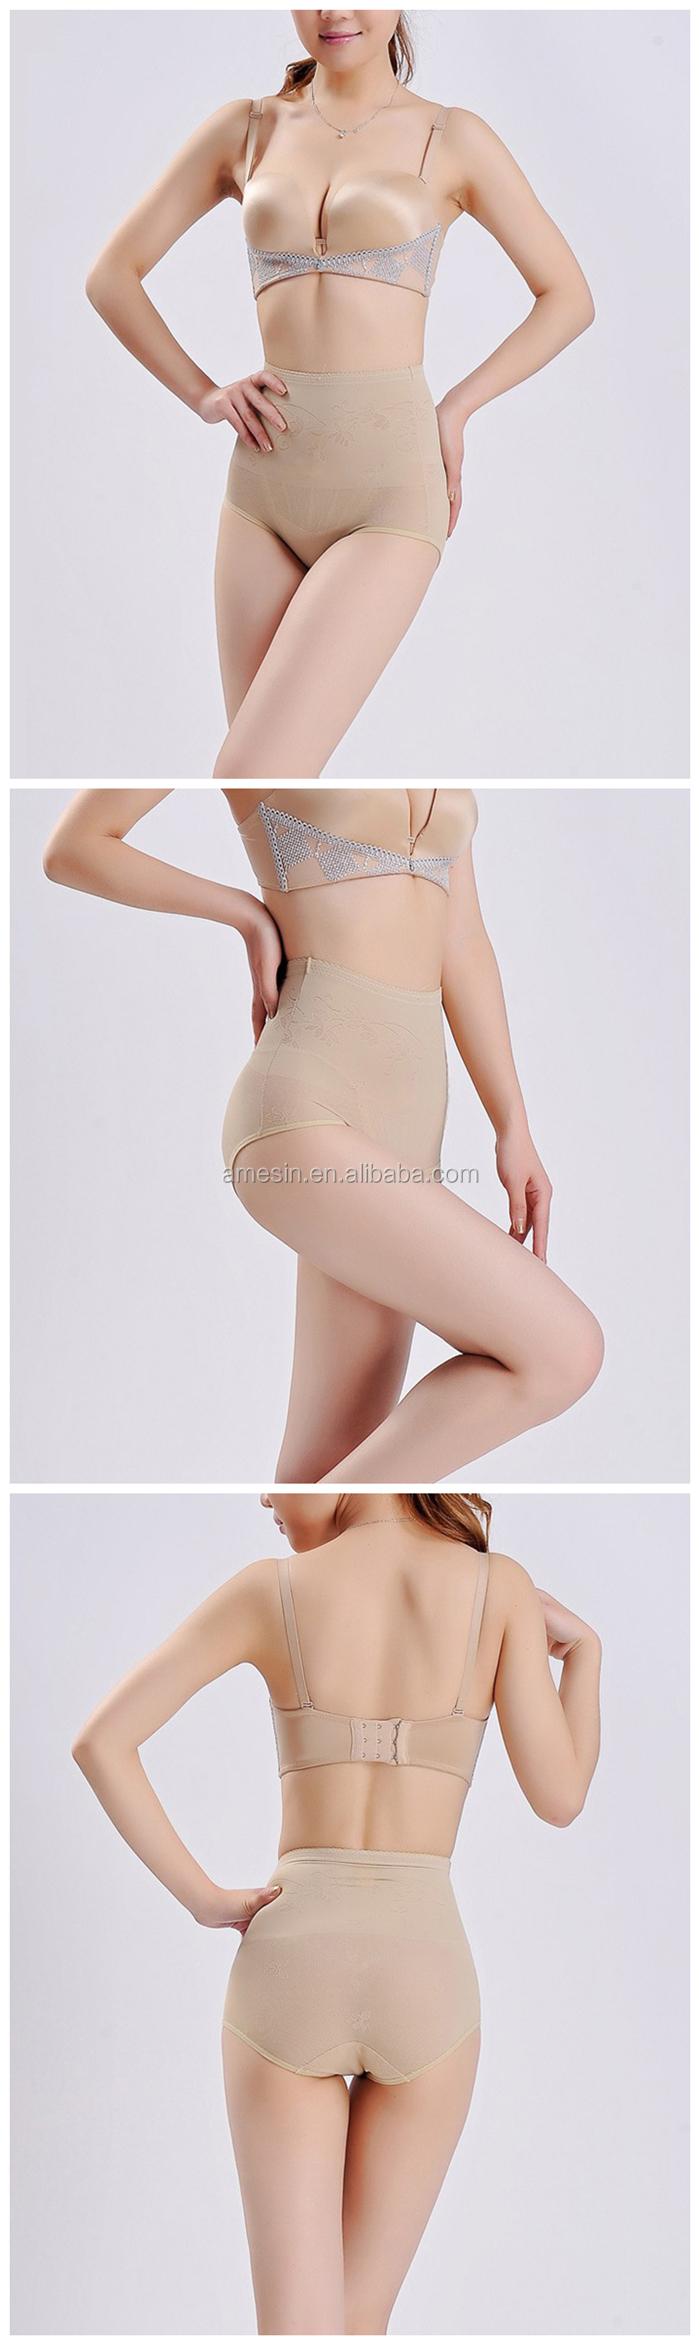 GARDLE BOUND 2015 New Style Ladies Girdle Bound Panties High Waist Slimming Lady Panty Stock